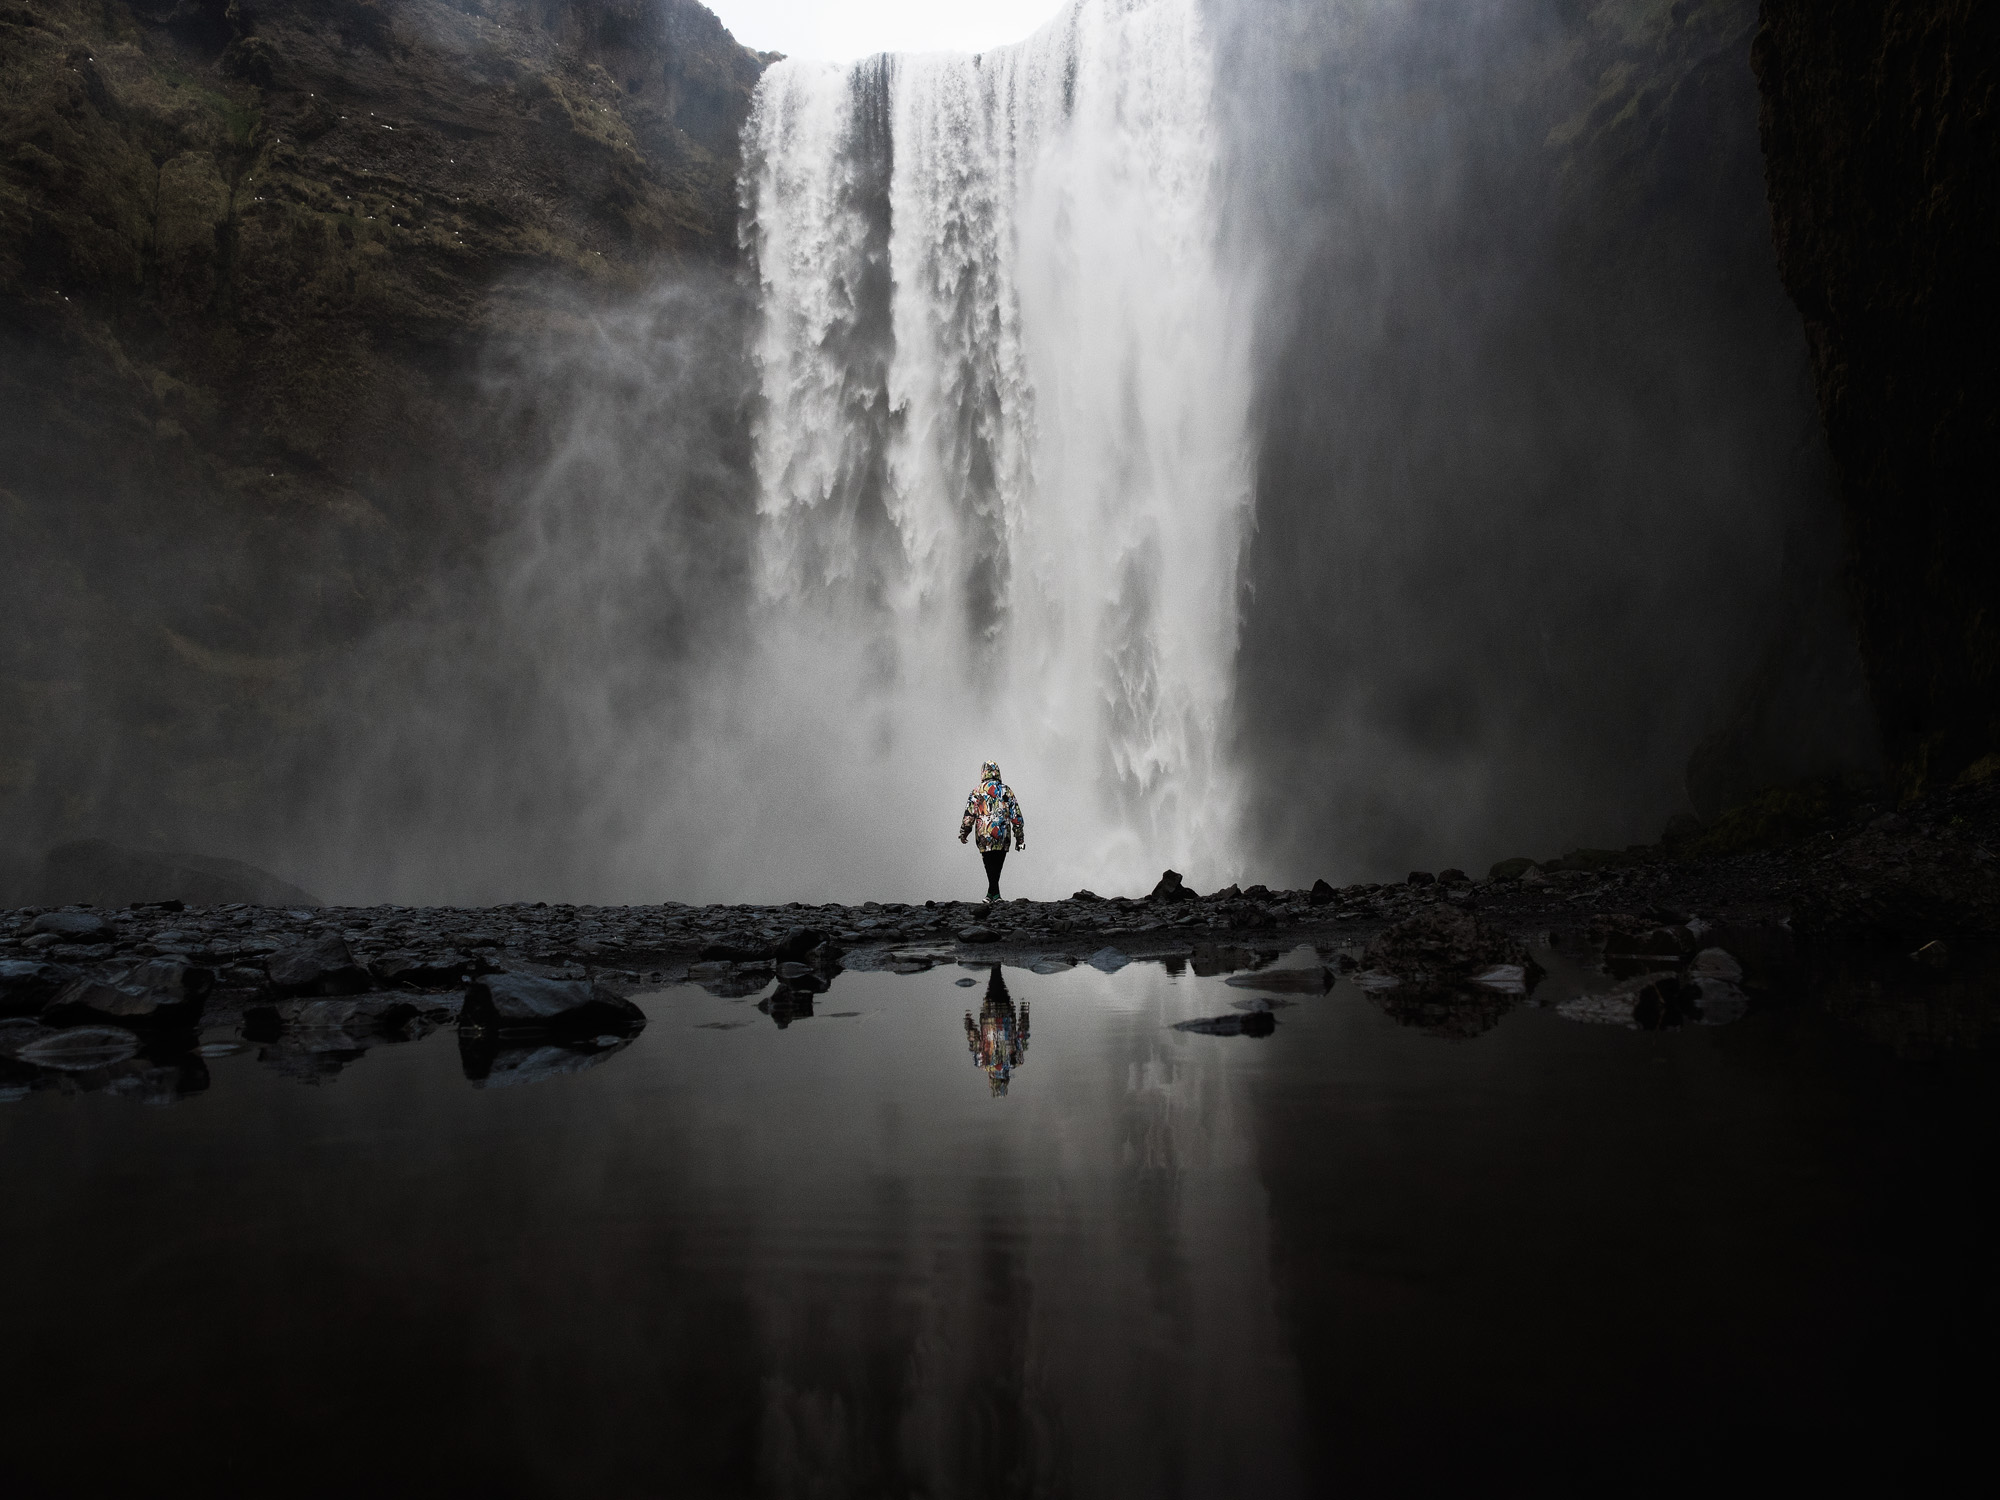 Iceland_olympus20141023_ARA_13.jpg